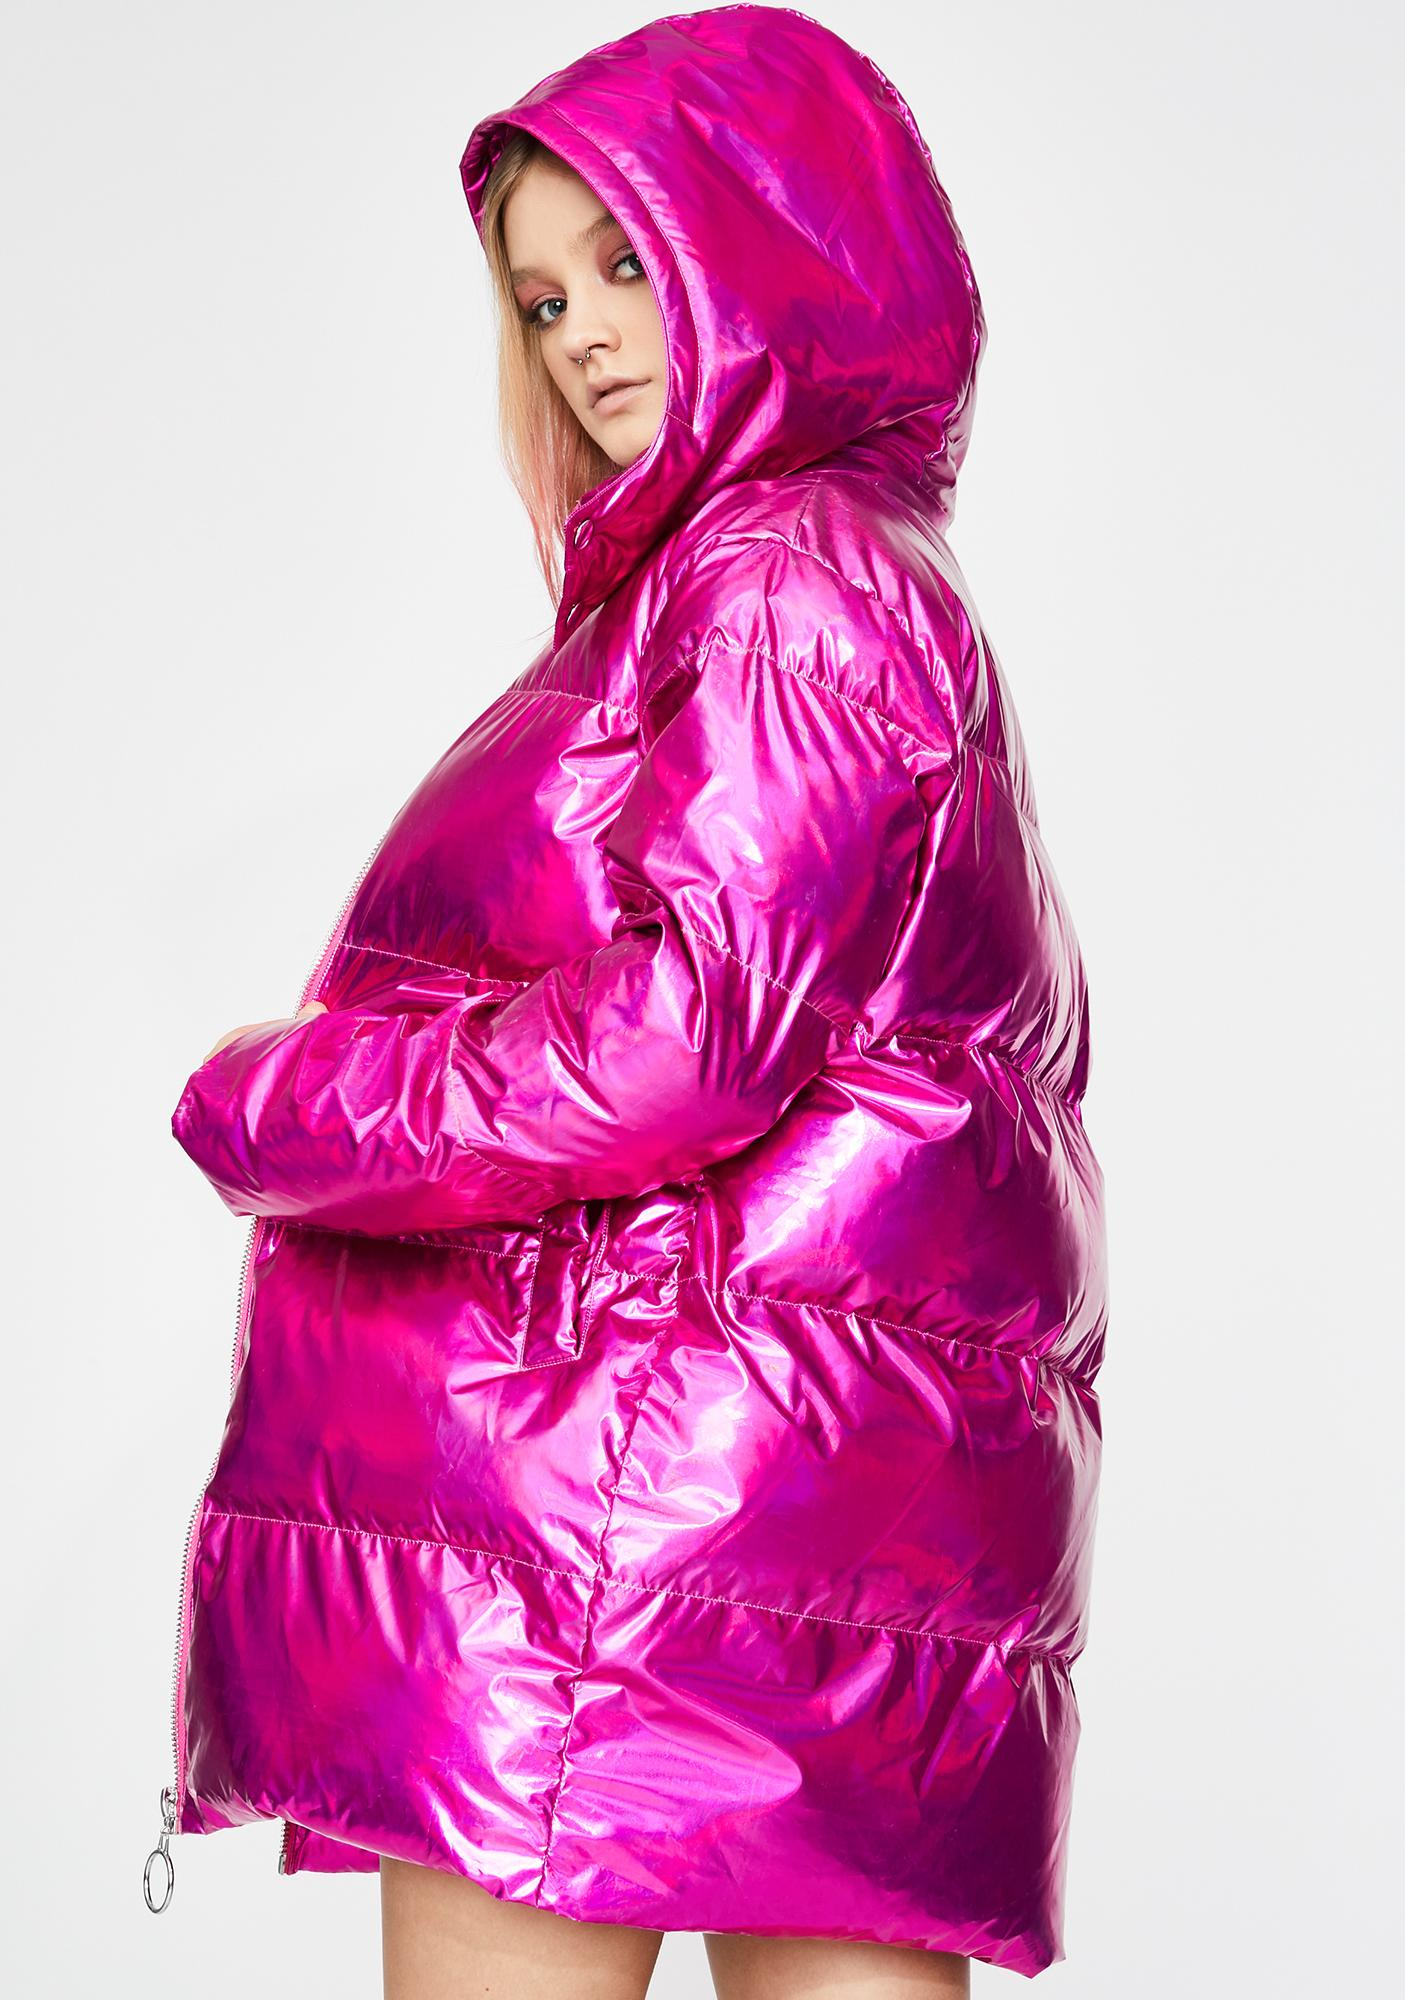 Club Exx Sensory Ecstasy Puffer Jacket